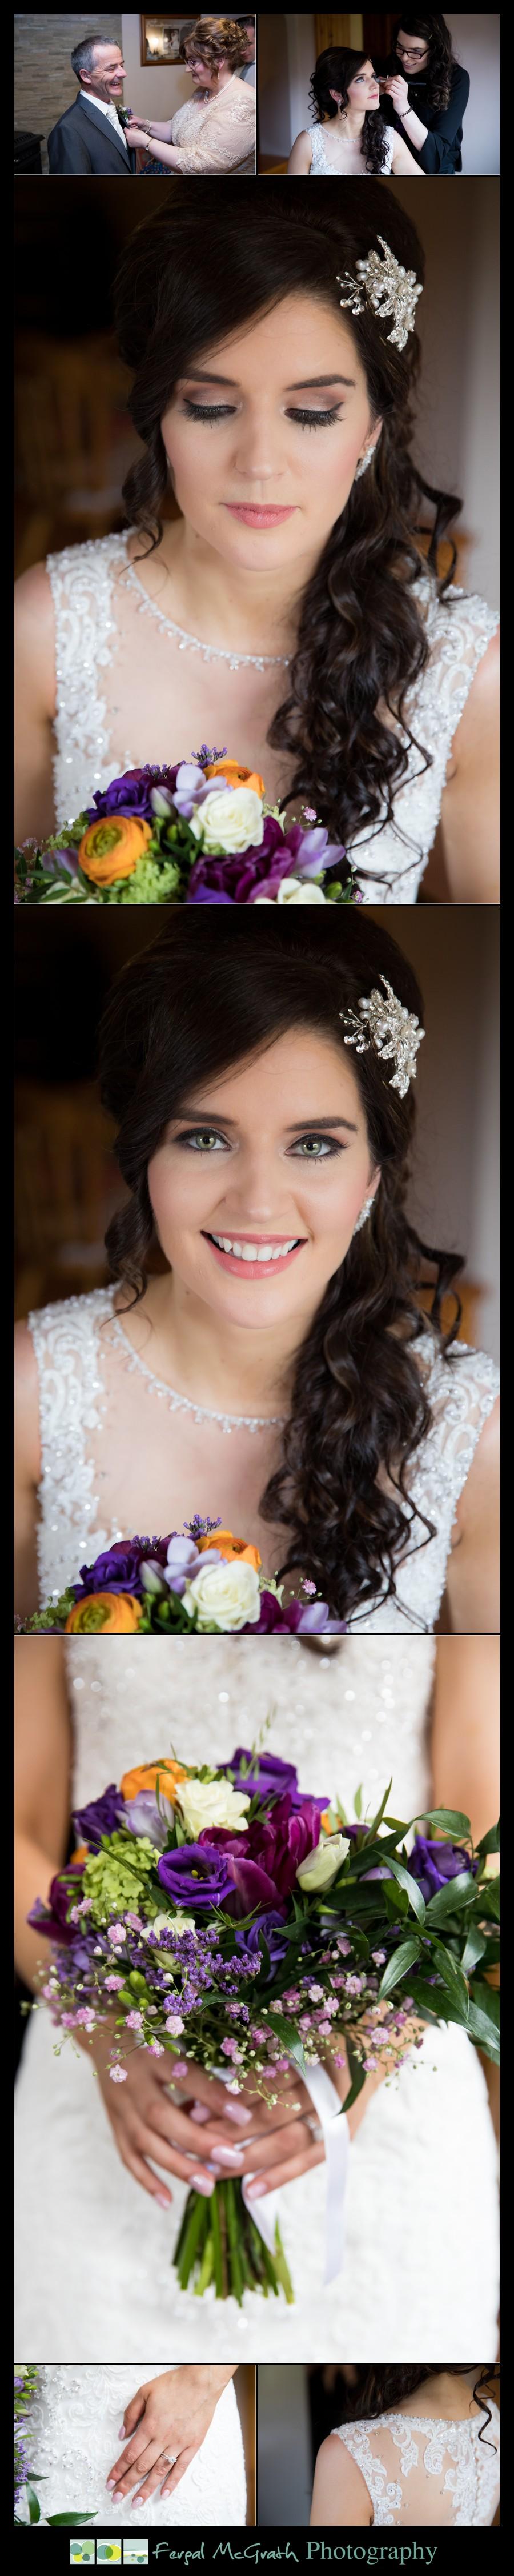 Glencolmcille wedding beautiful bride